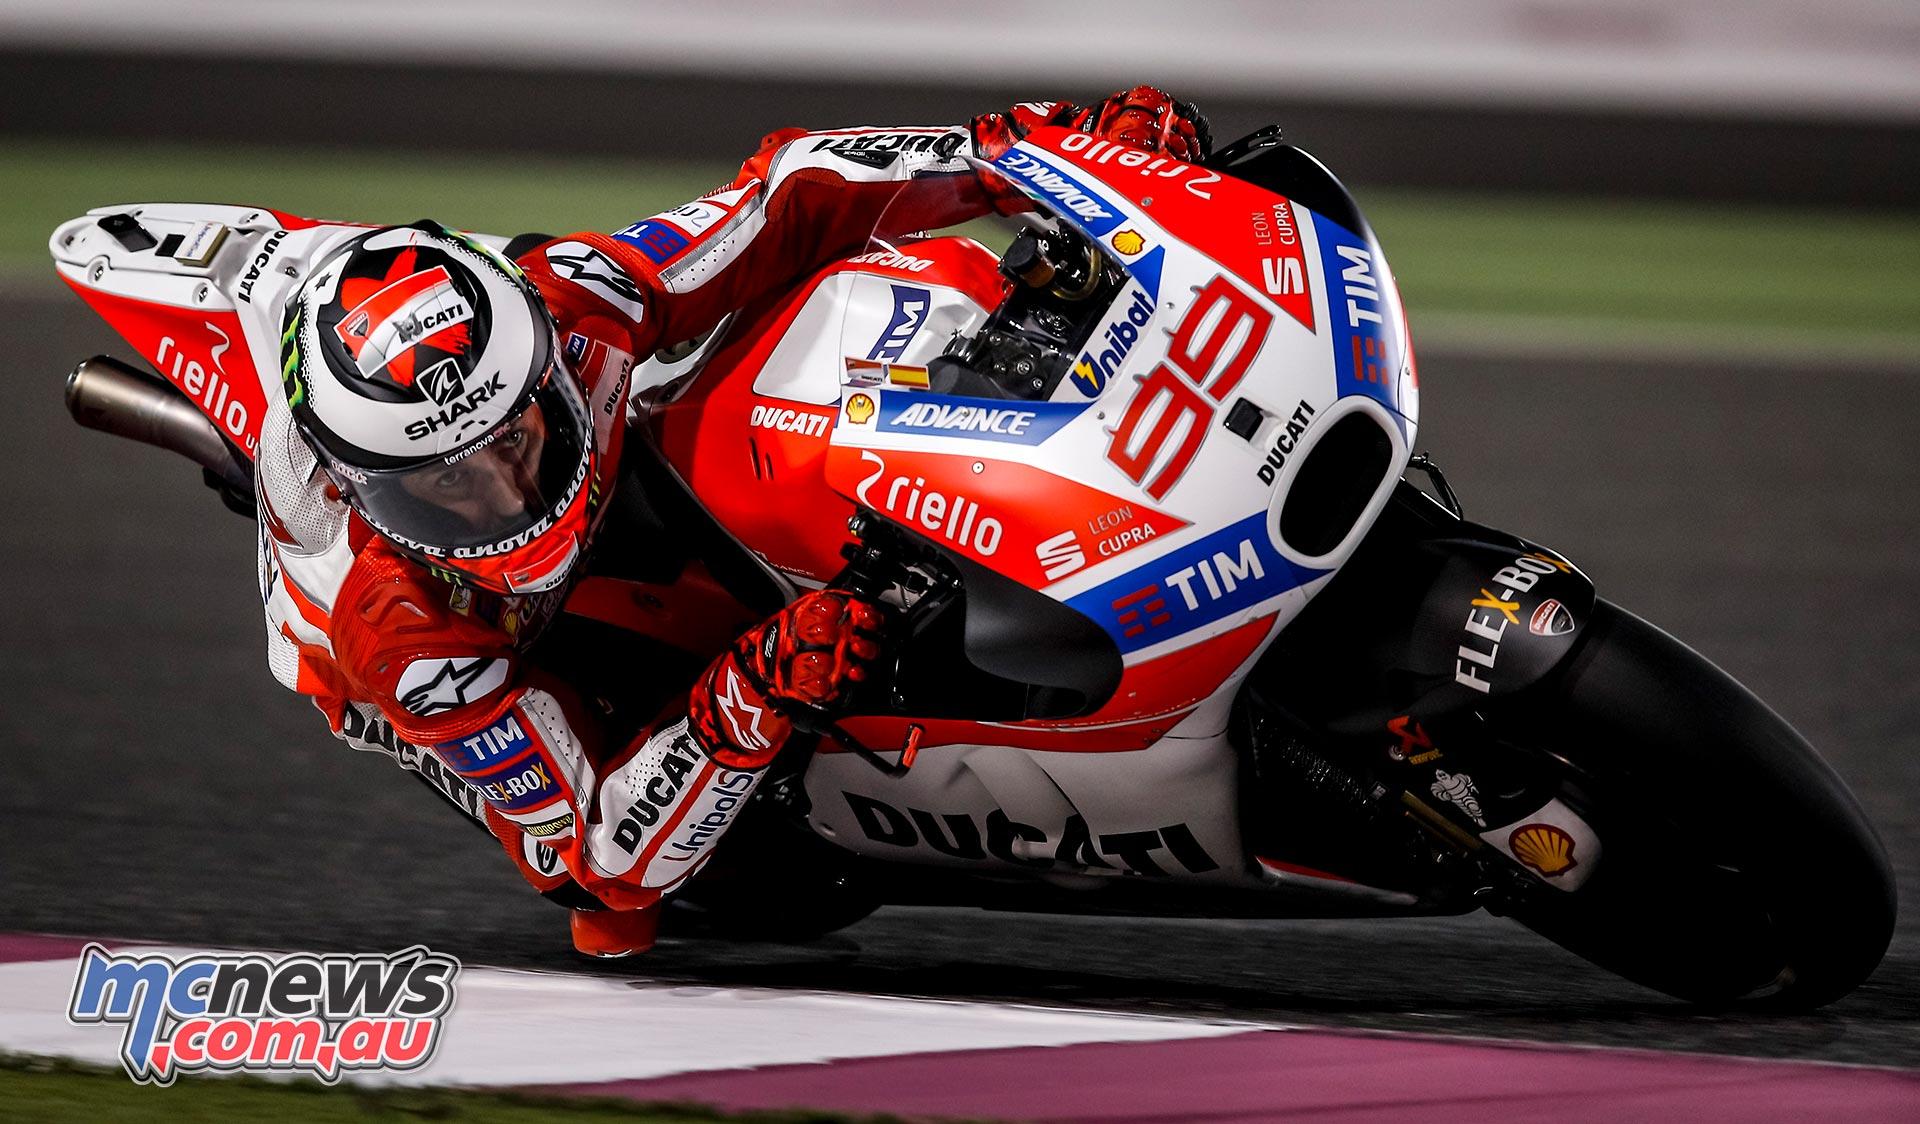 Vinales tops Qatar Day 2 | New Ducati nose steals show | MCNews.com.au